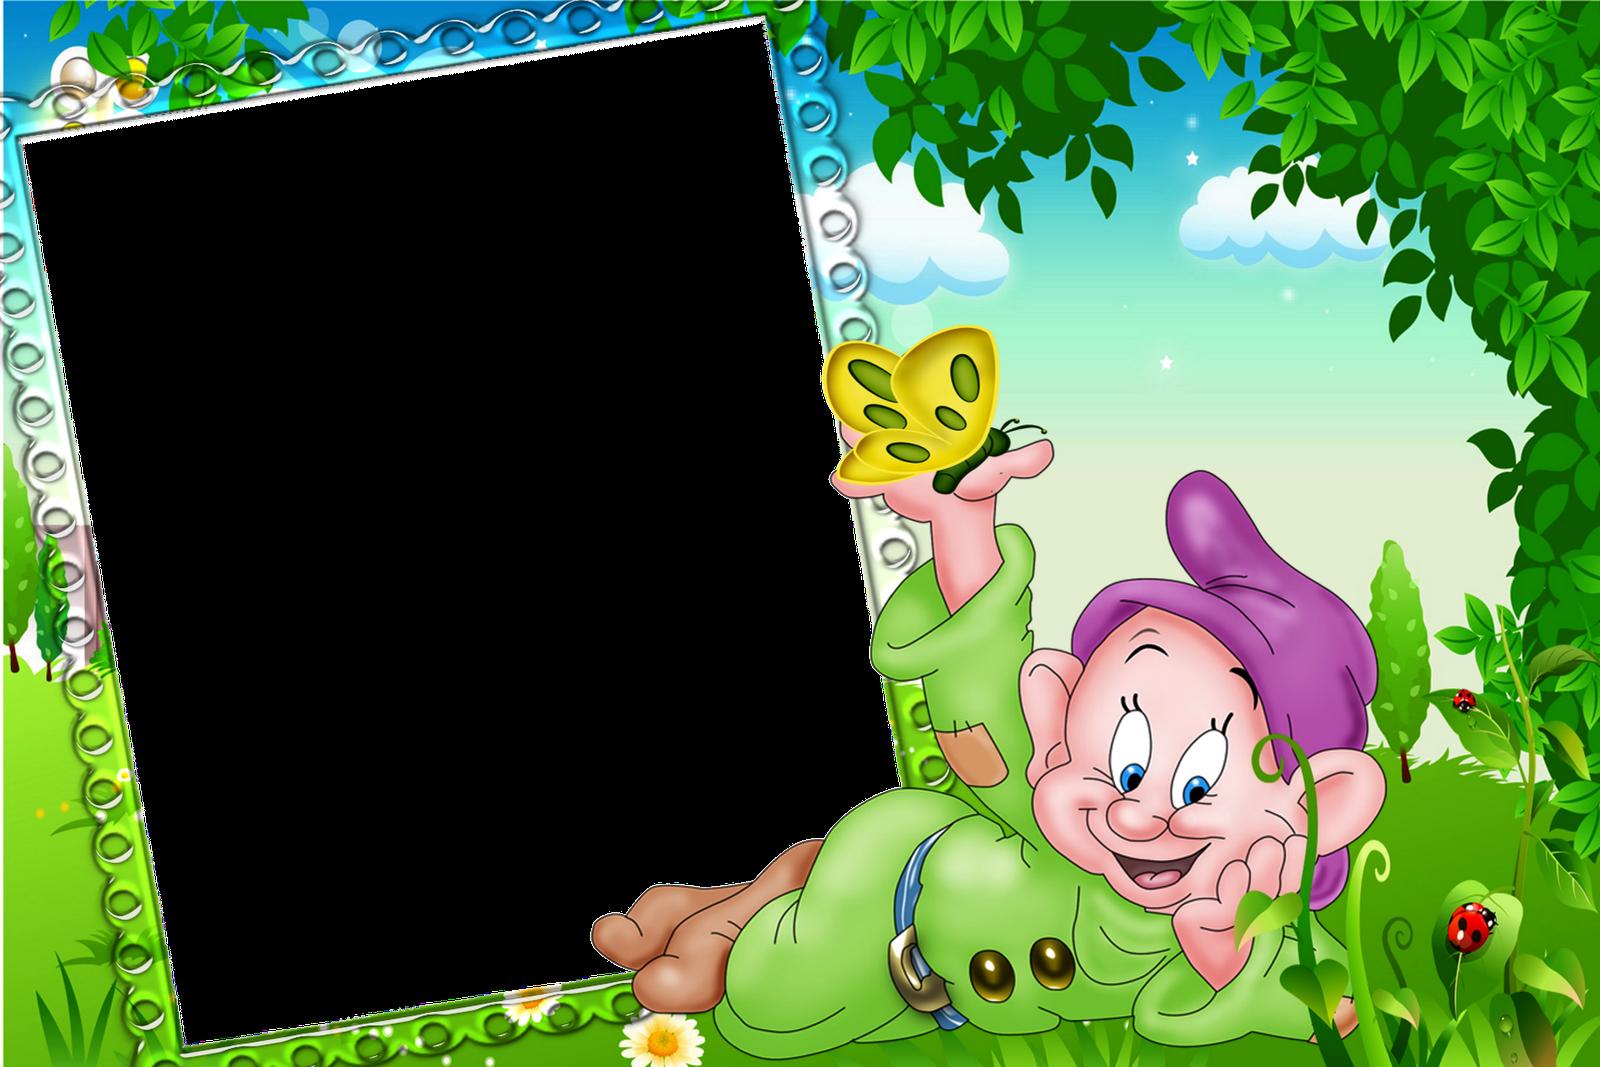 Children transparent frame with. Frames clipart nature